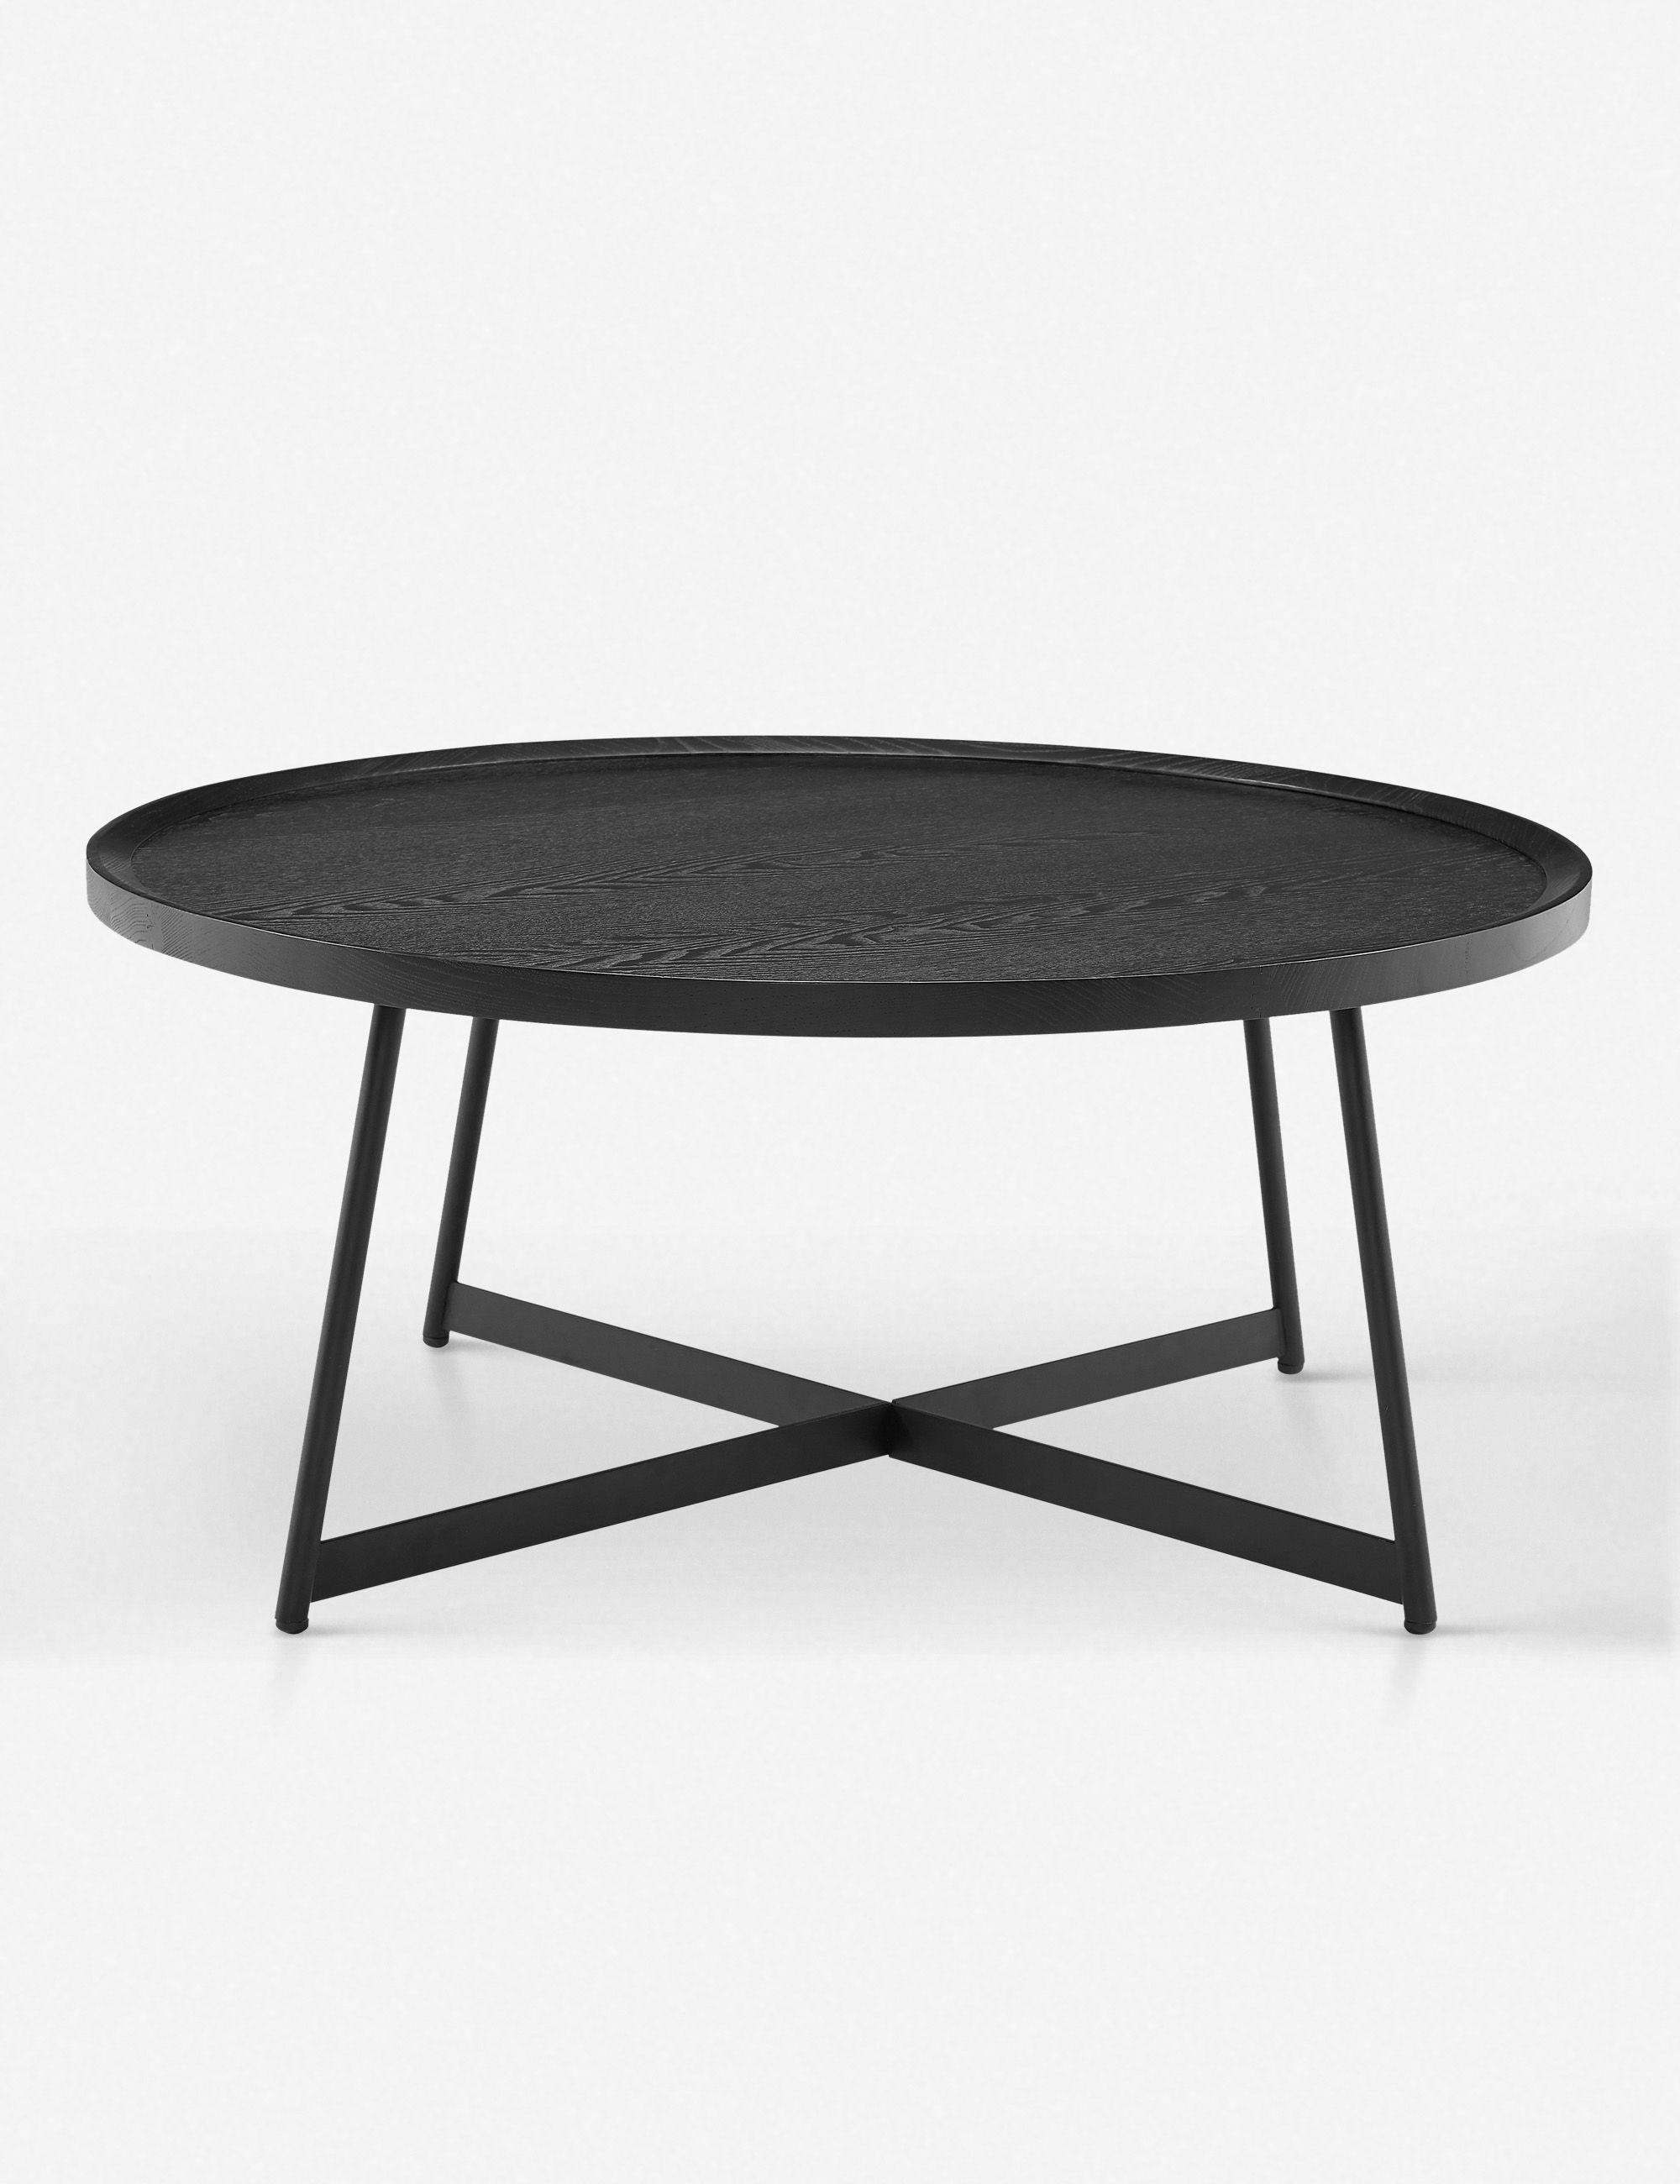 Gweneth Round Coffee Table Black Ash Round Coffee Table Coffee Table Black Coffee Tables [ 2600 x 2000 Pixel ]